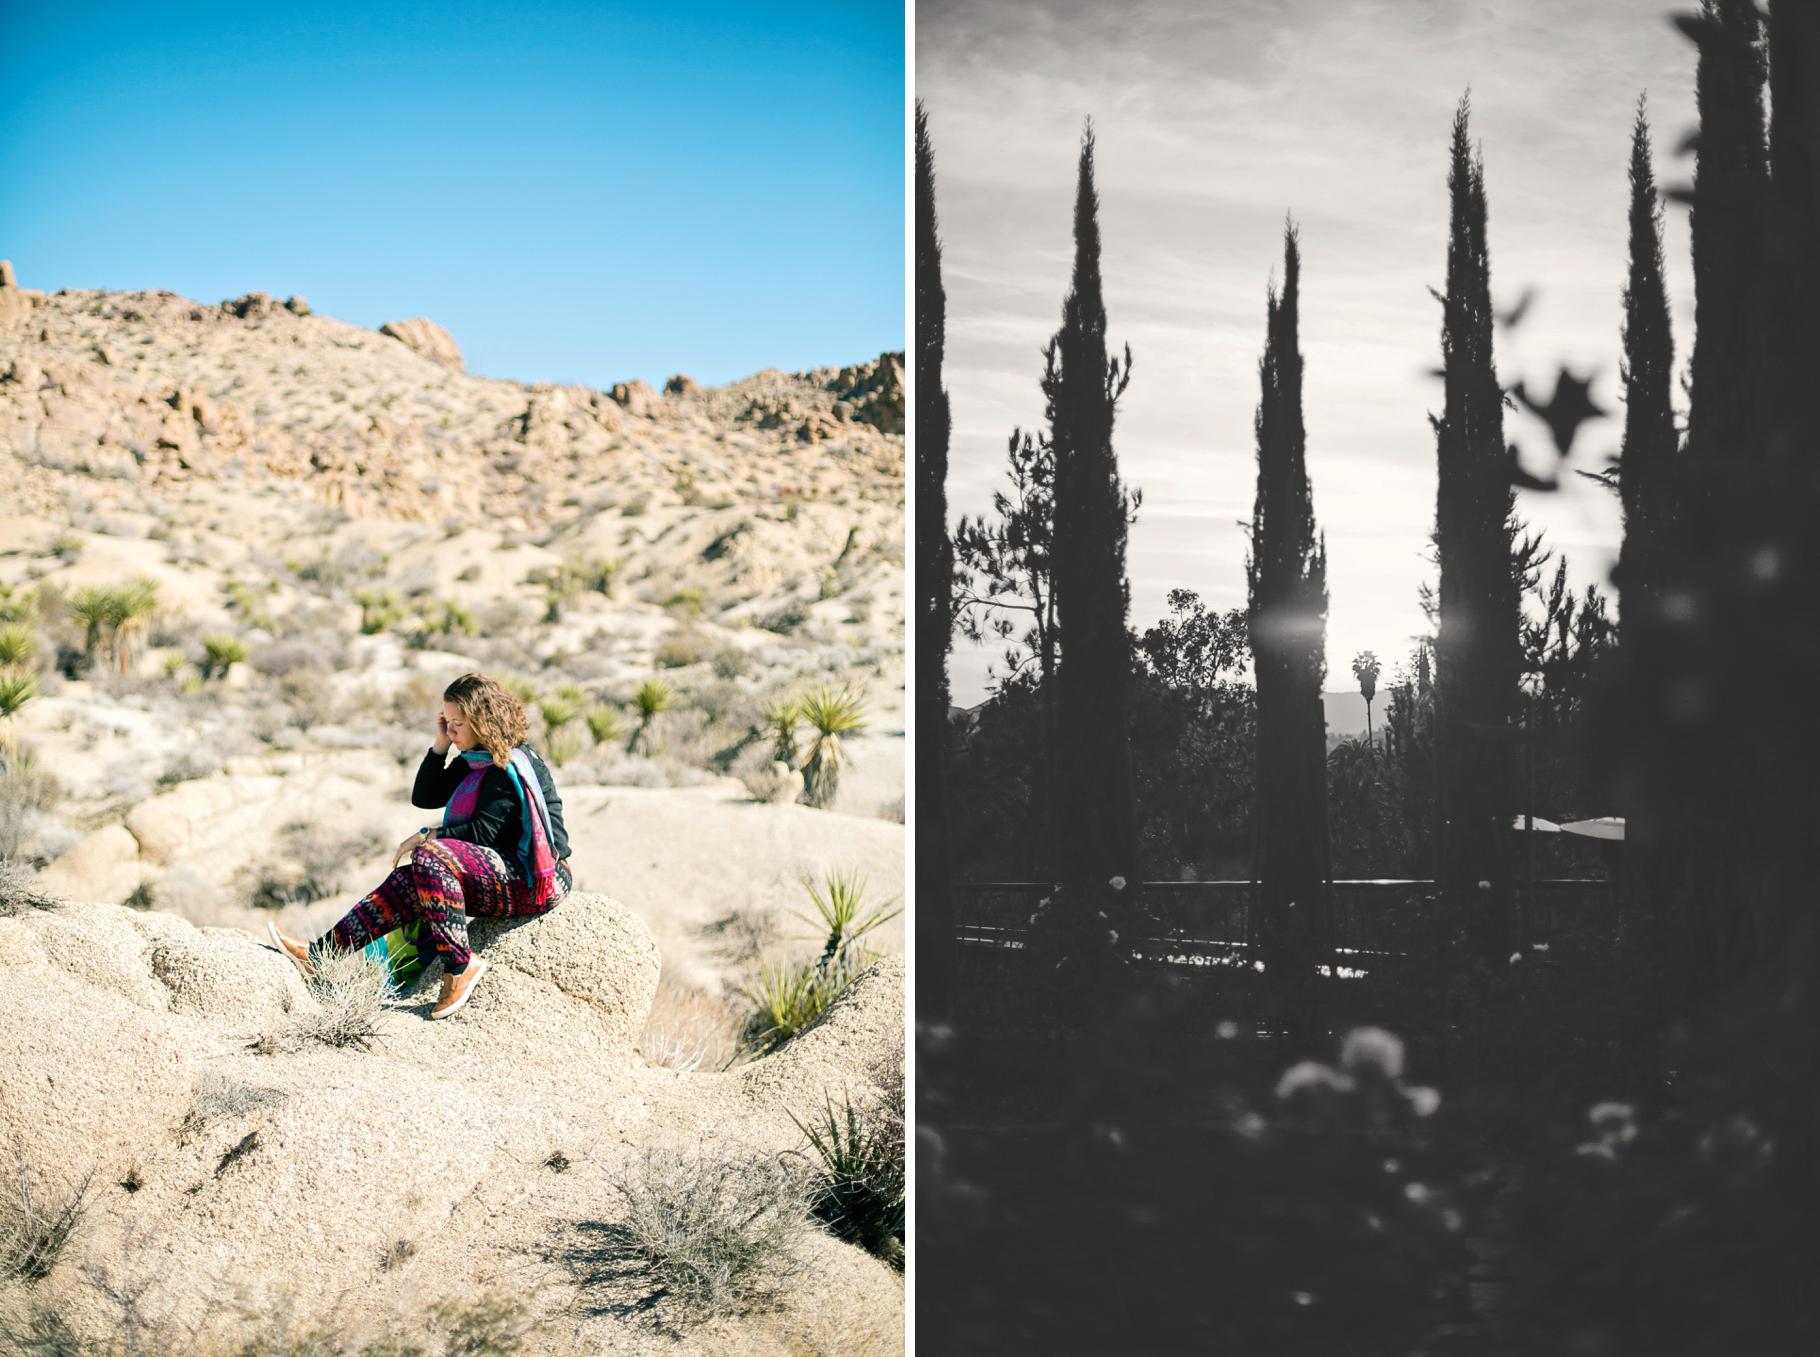 3-2015-Photographer-Joshua-Tree-National-Park-Arizona-California-Temecula-Winery-Year-in-Review-Seattle-Wedding-Photography-by-Betty-Elaine